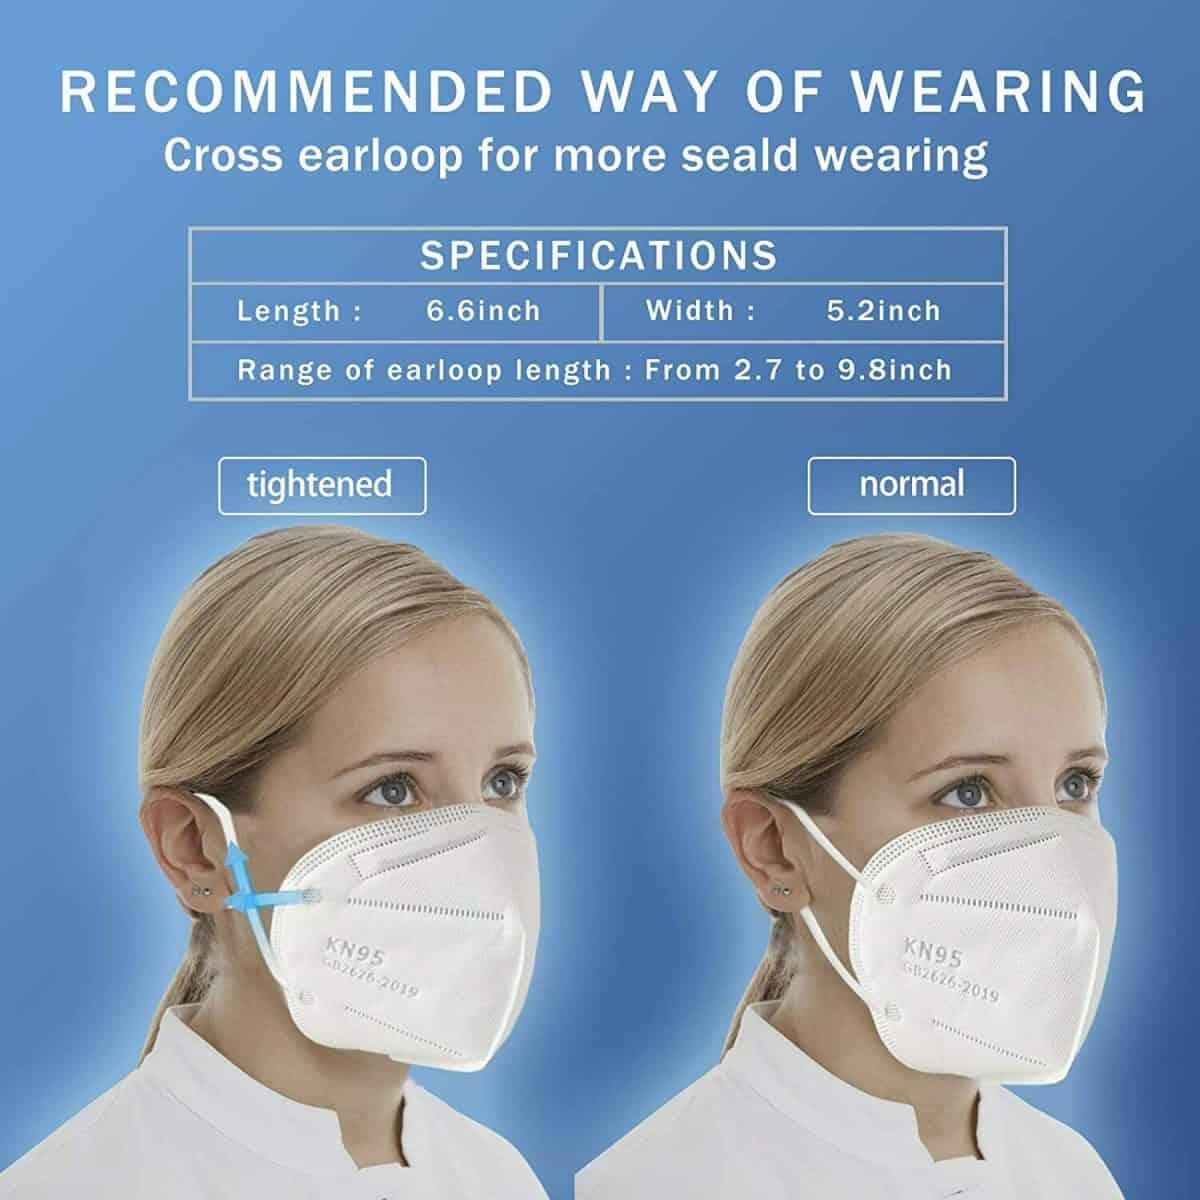 100 Pcs KN95 Protective 5 Layers Face Mask BFE 95% PM2.5 Disposable K N95 Masks 7